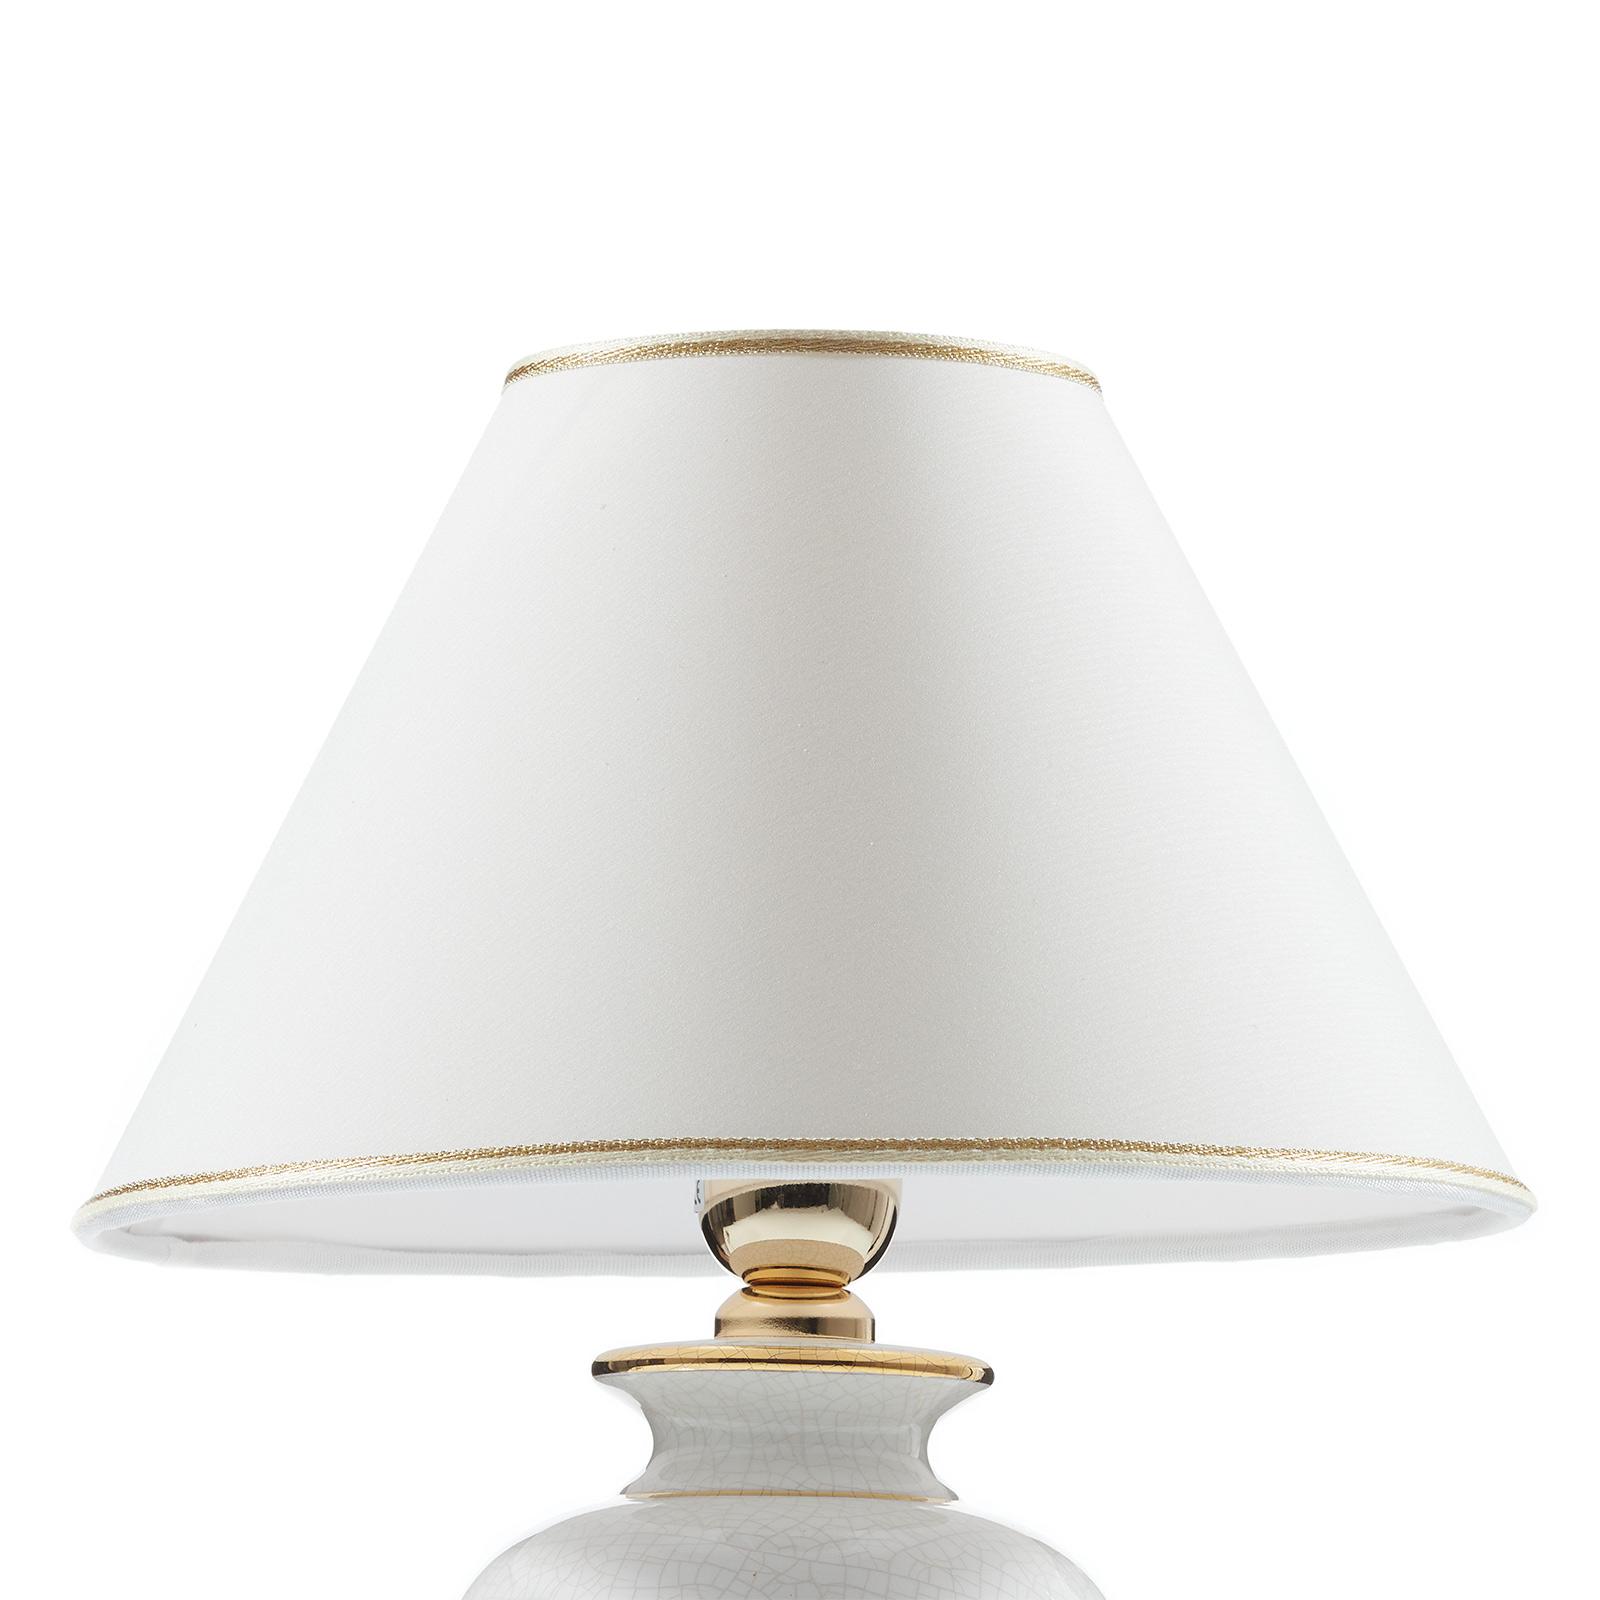 Kolarz Giardino Craclee White Table Lamp 30 Cm Lights Co Uk